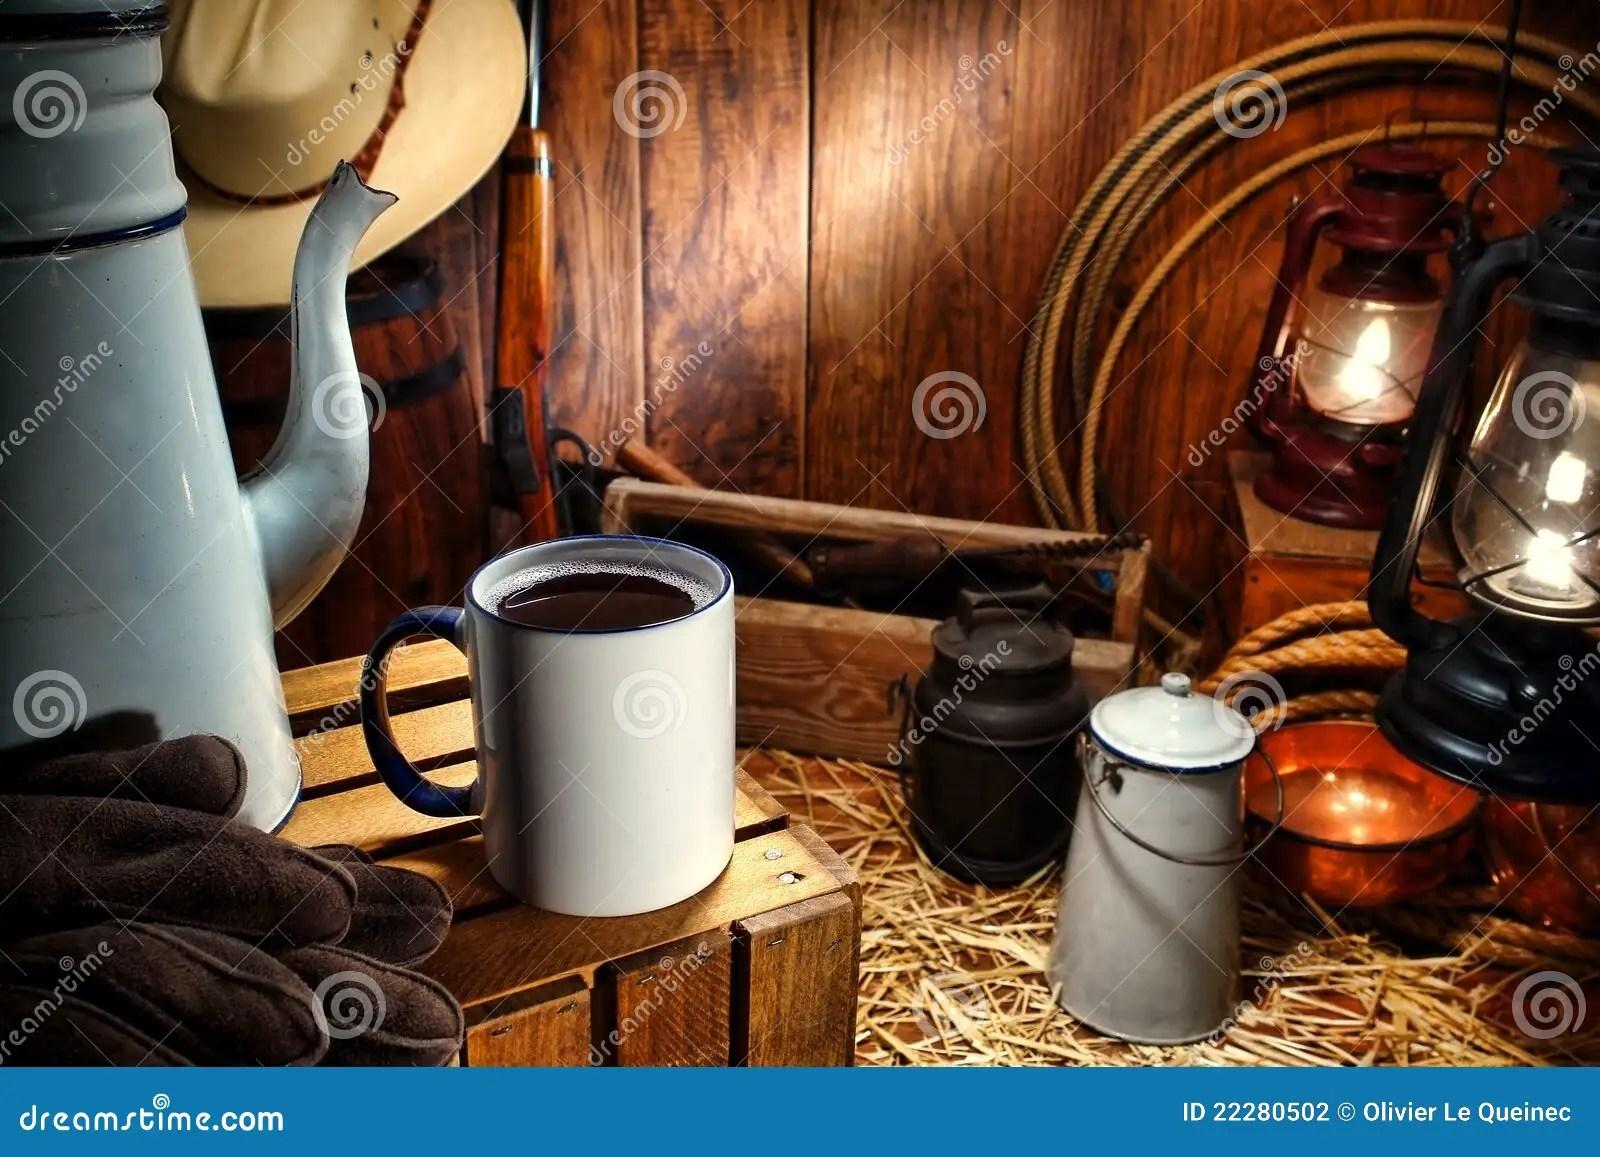 Old West Coffee Mug In Antique Western Chuck Wagon Stock